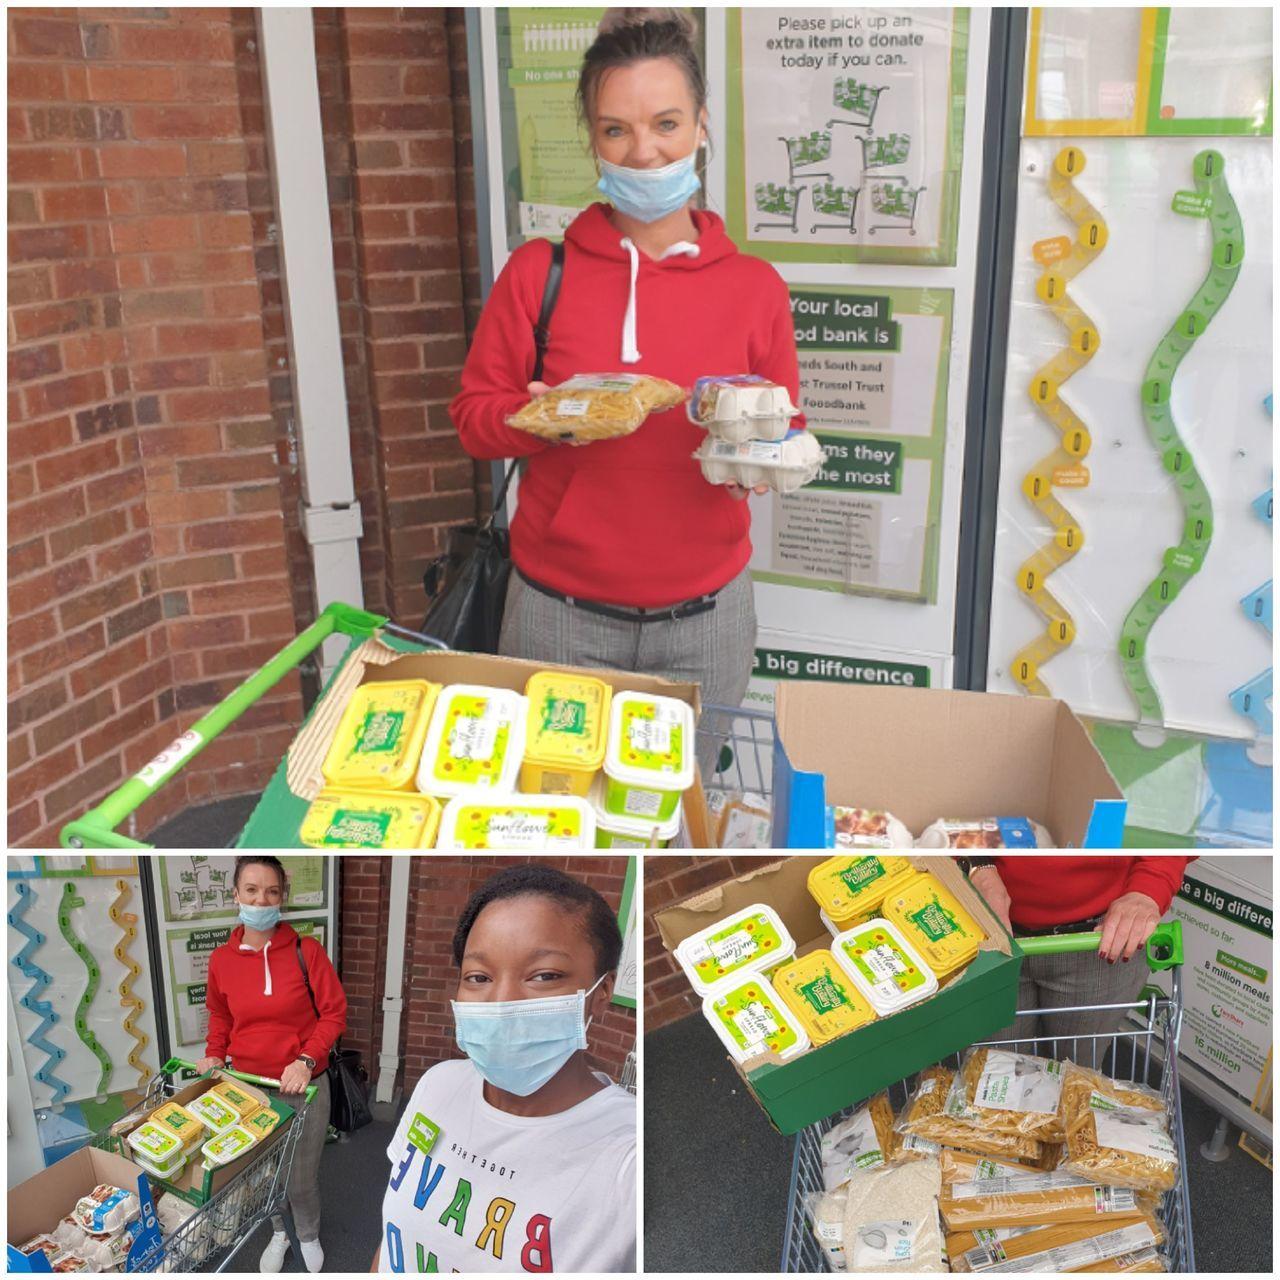 Donation for Hovingham Primary School food parcels | Asda Killingbeck